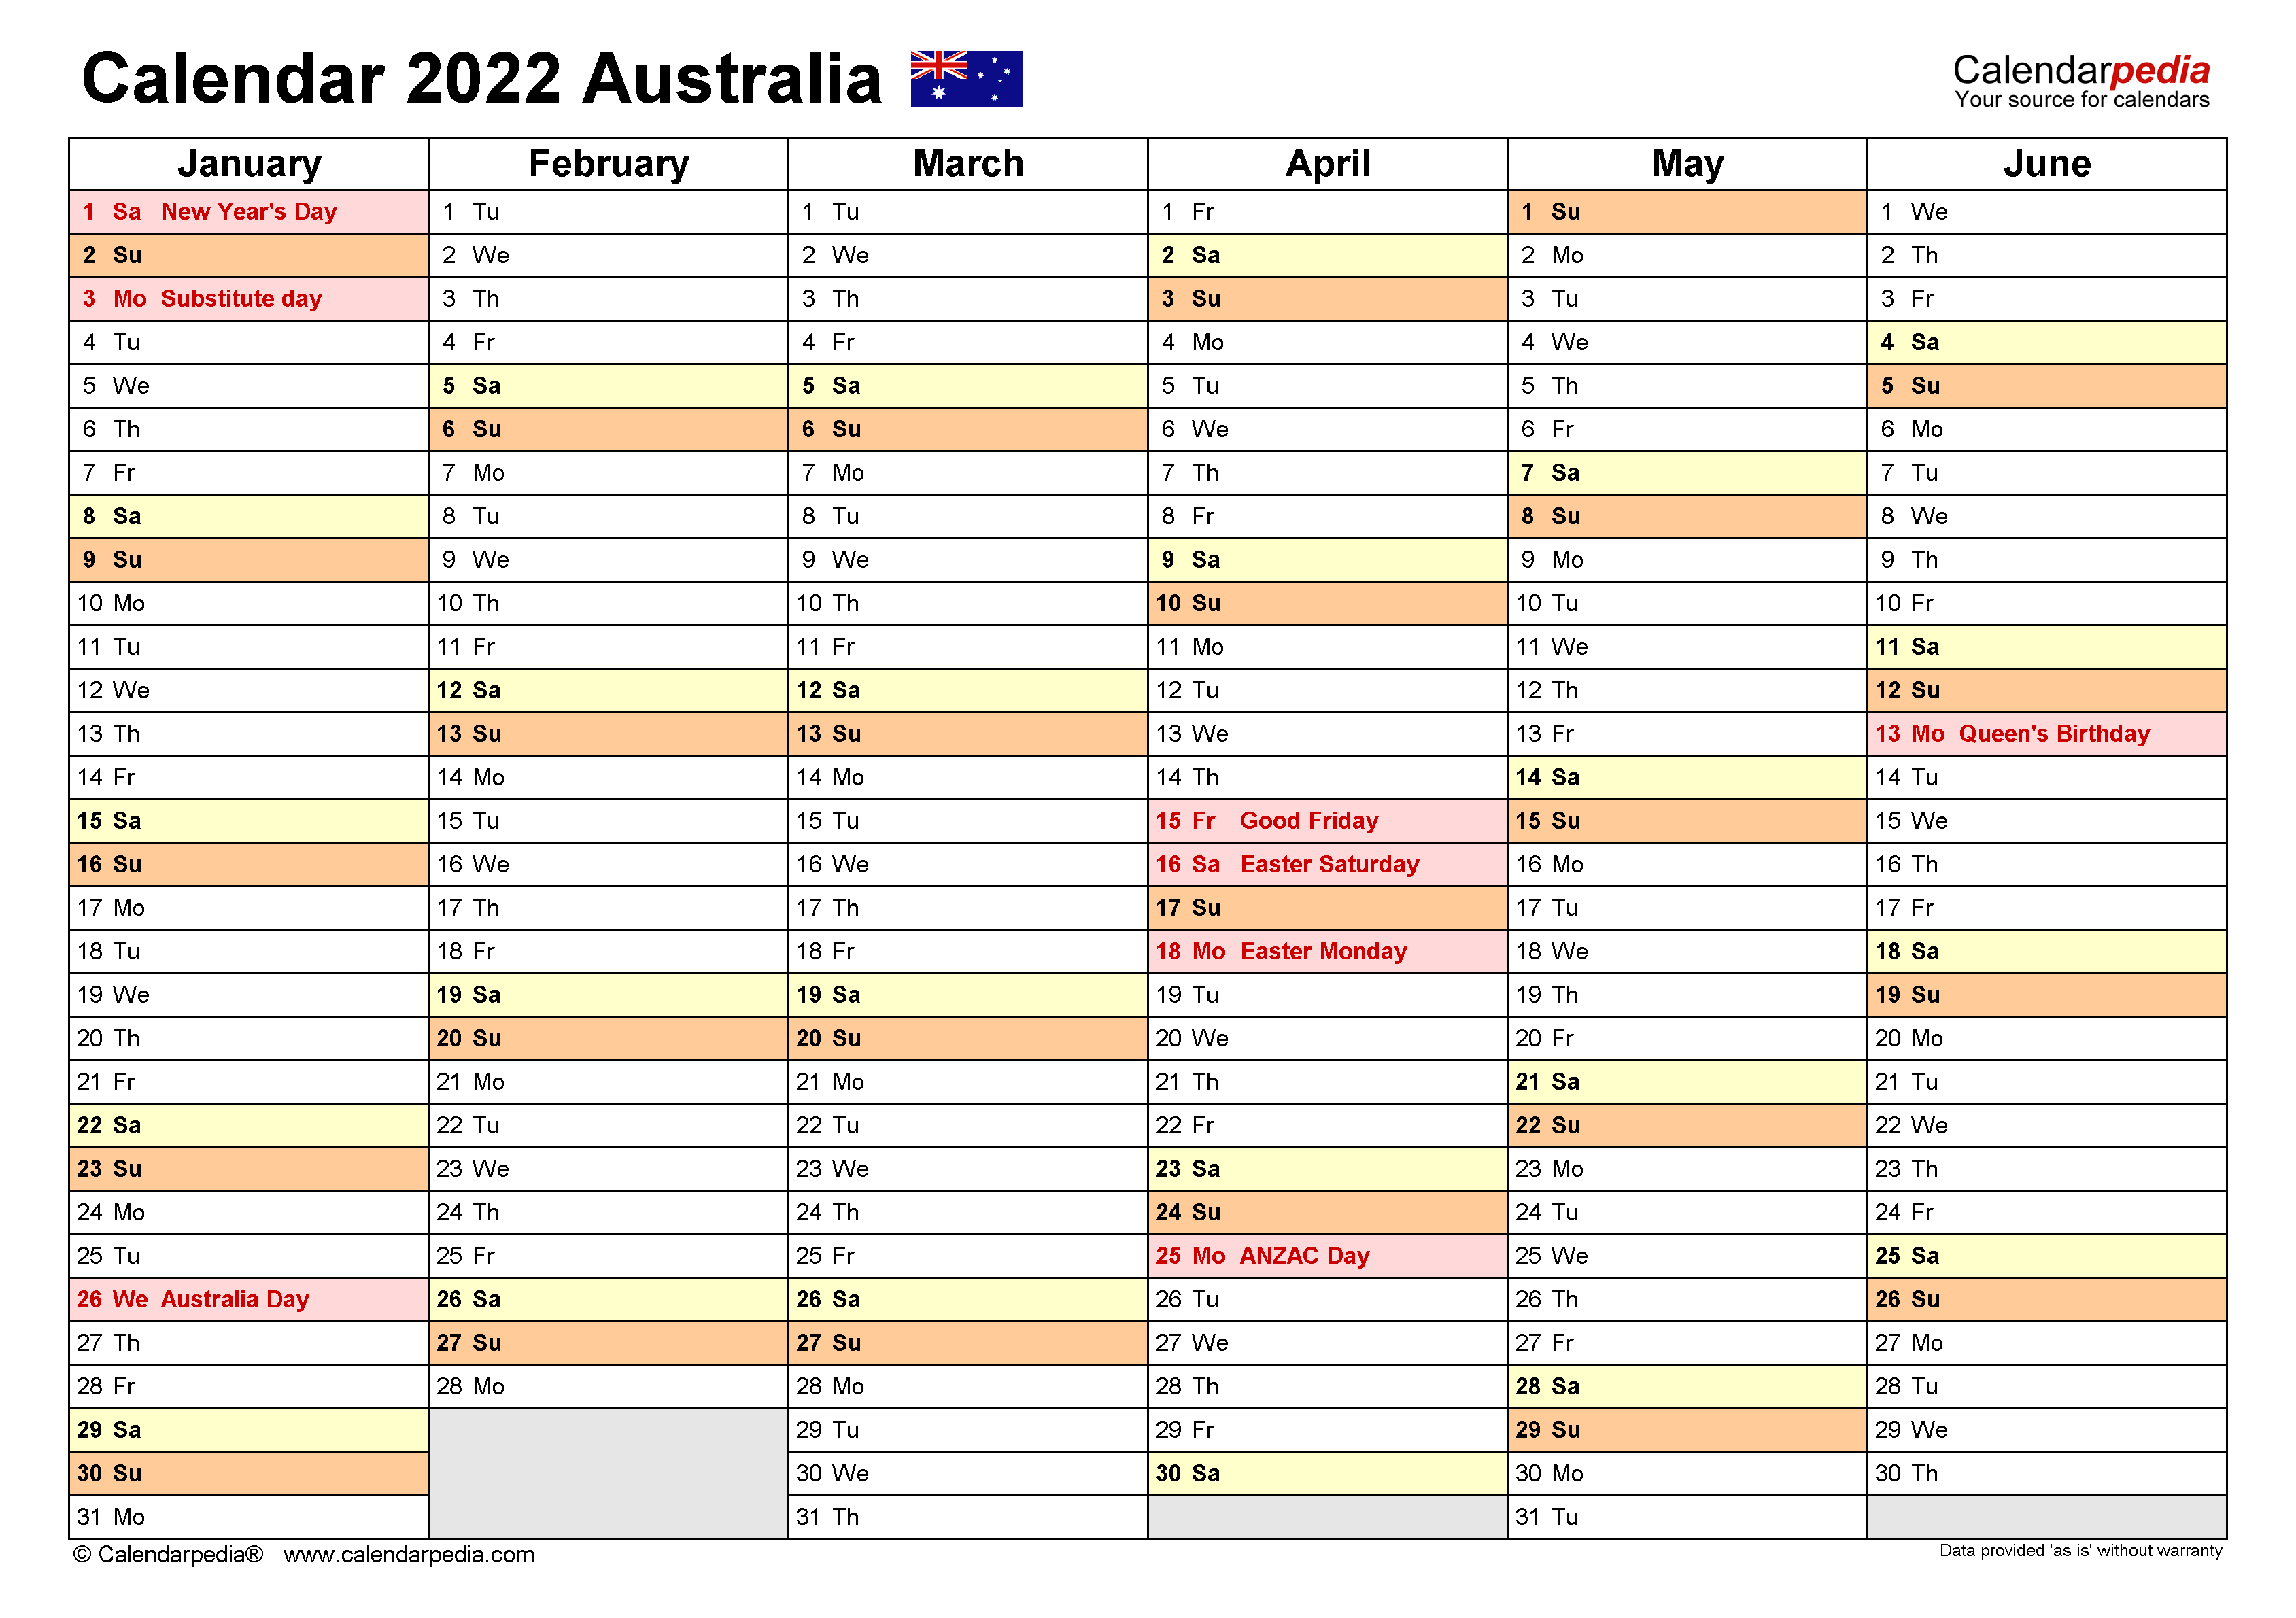 Australia Calendar 2022 - Free Printable PDF templates